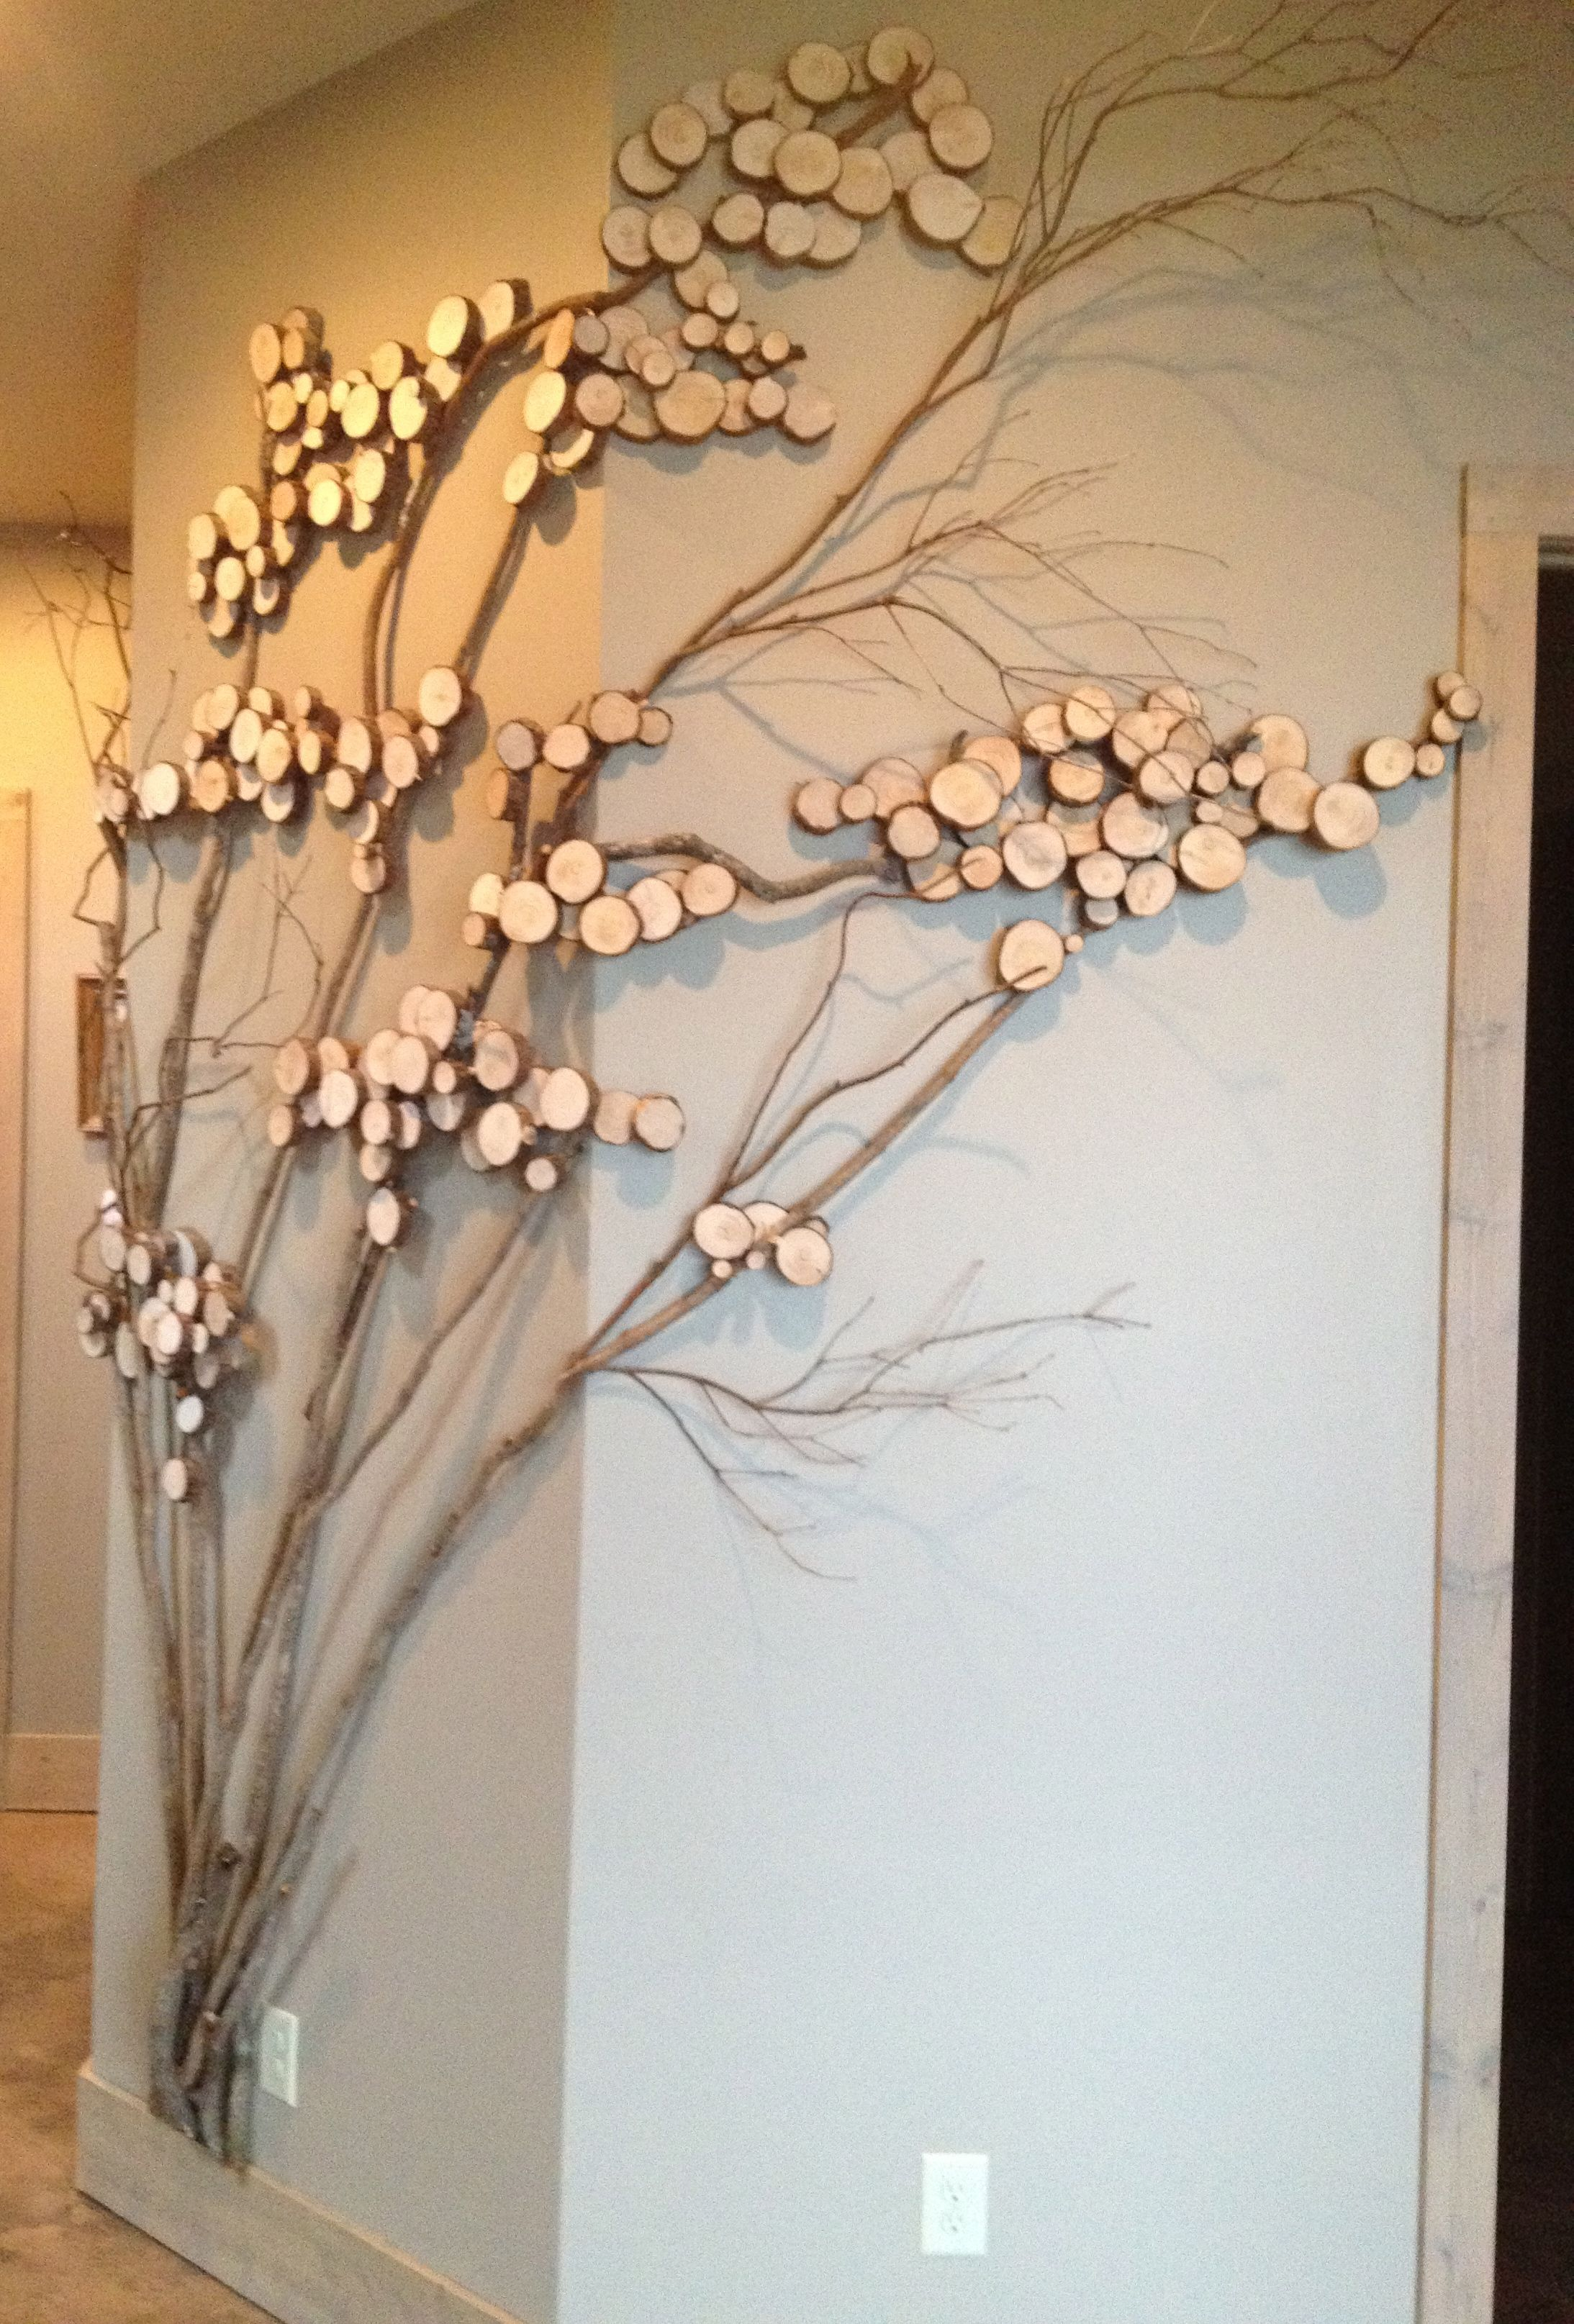 Küchenideen entlang einer wand refining tree art twig art for wall decor wall art with mountain